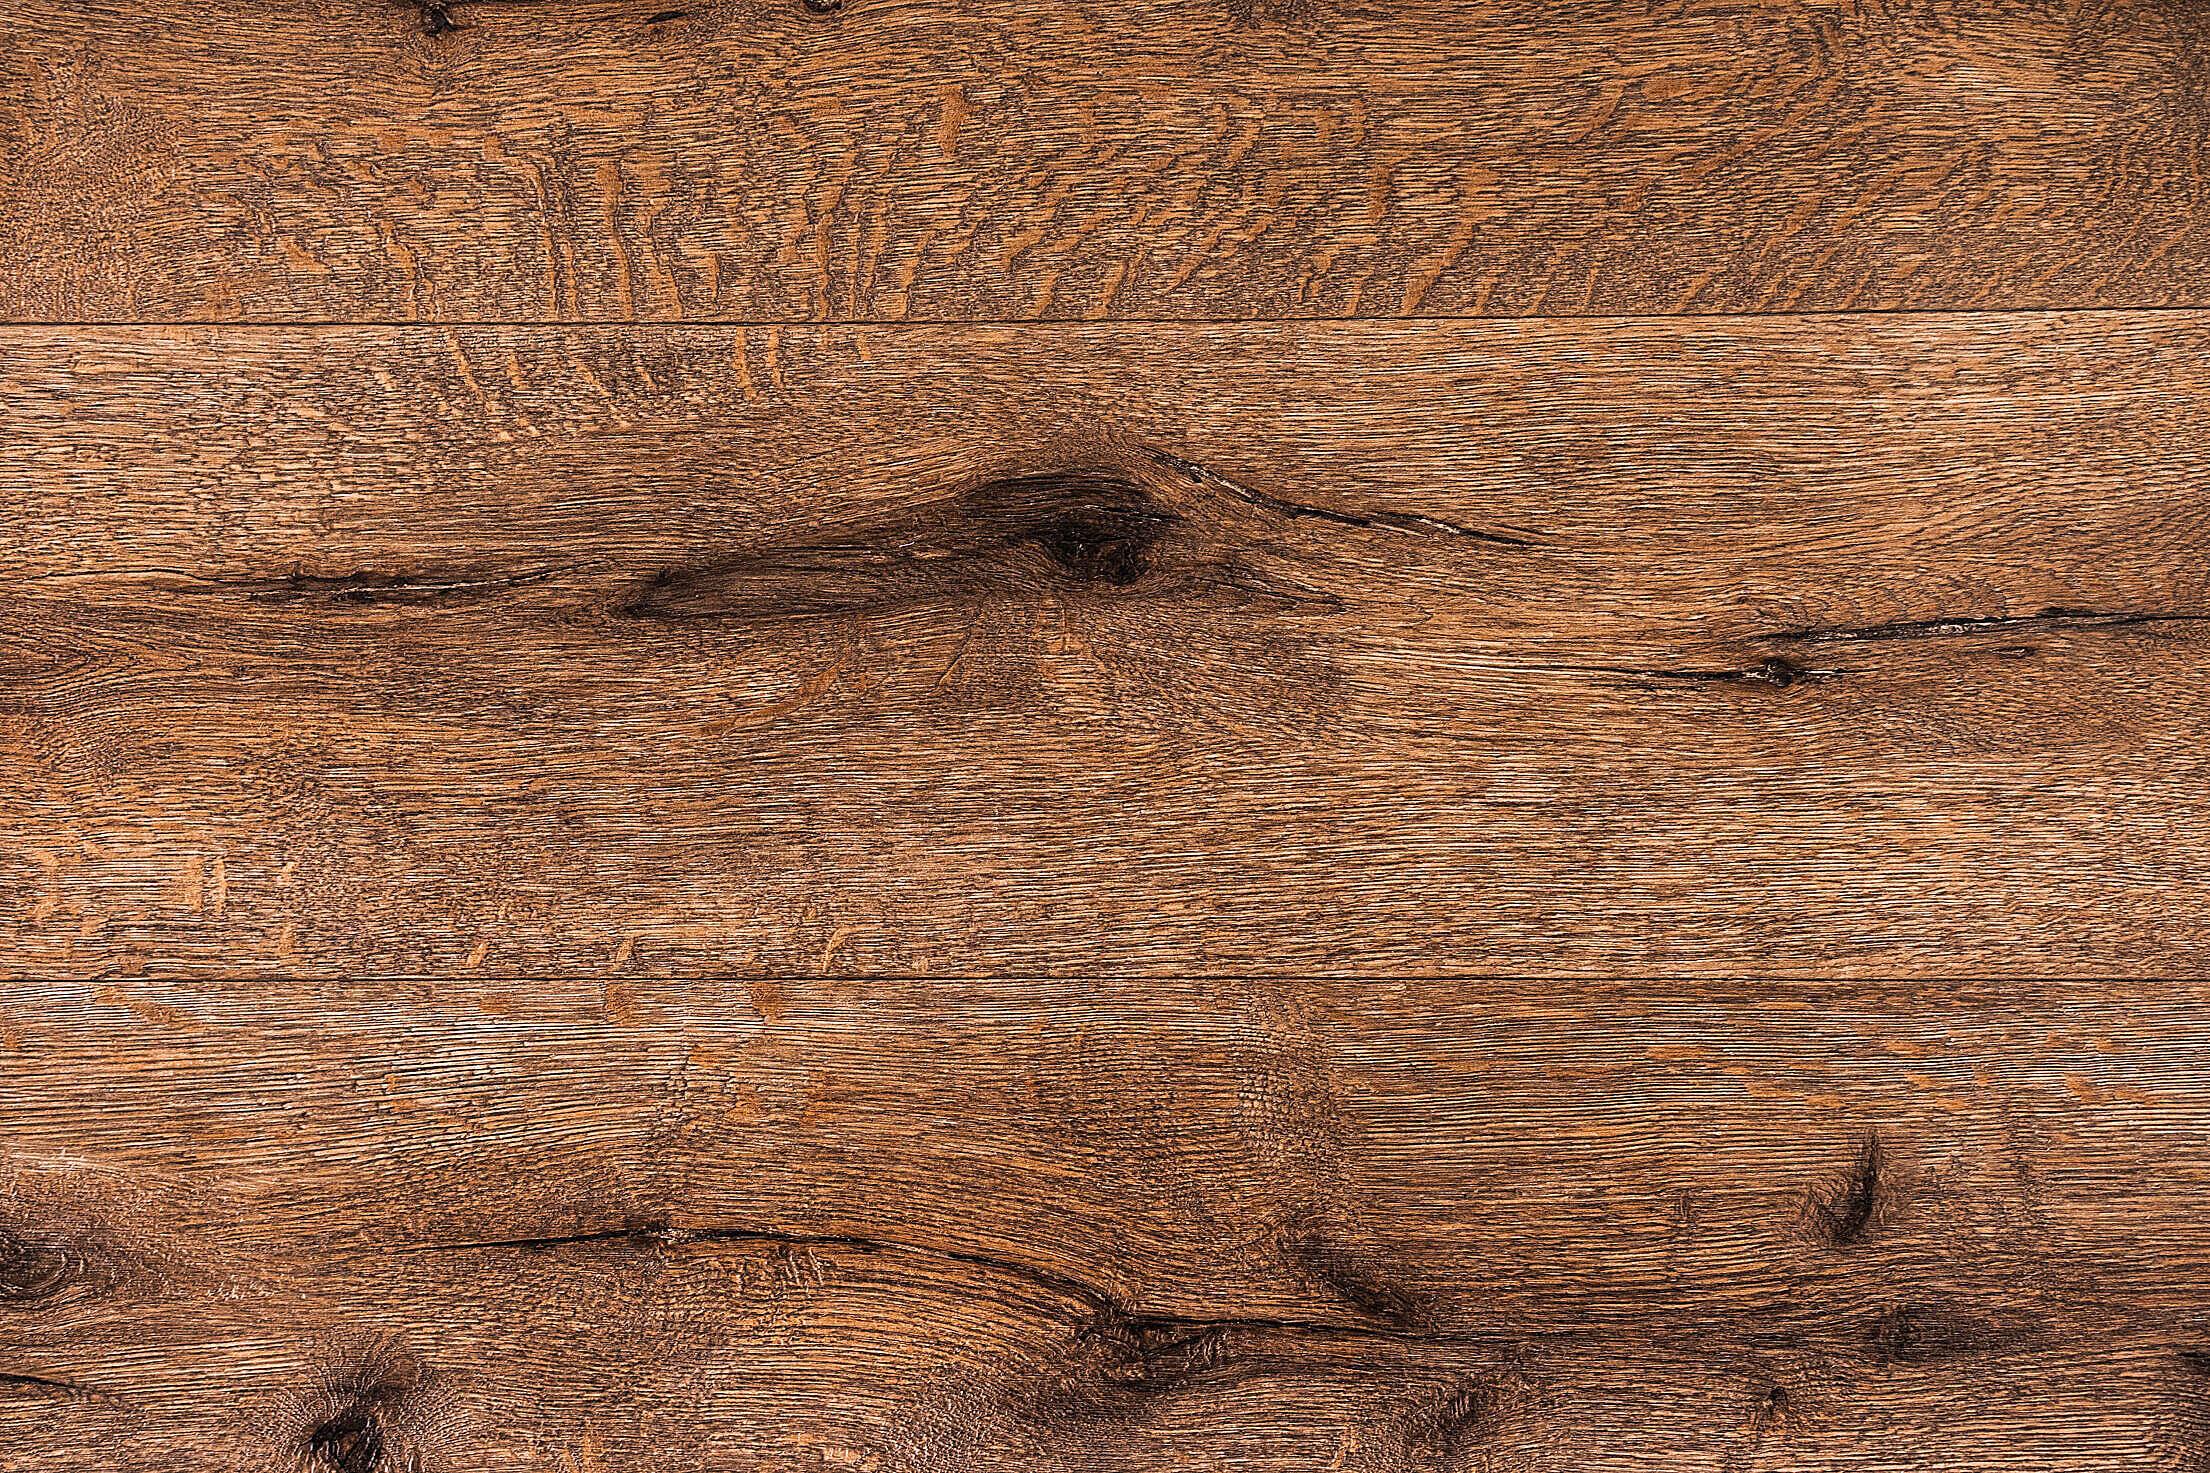 Wood Texture Free Stock Photo